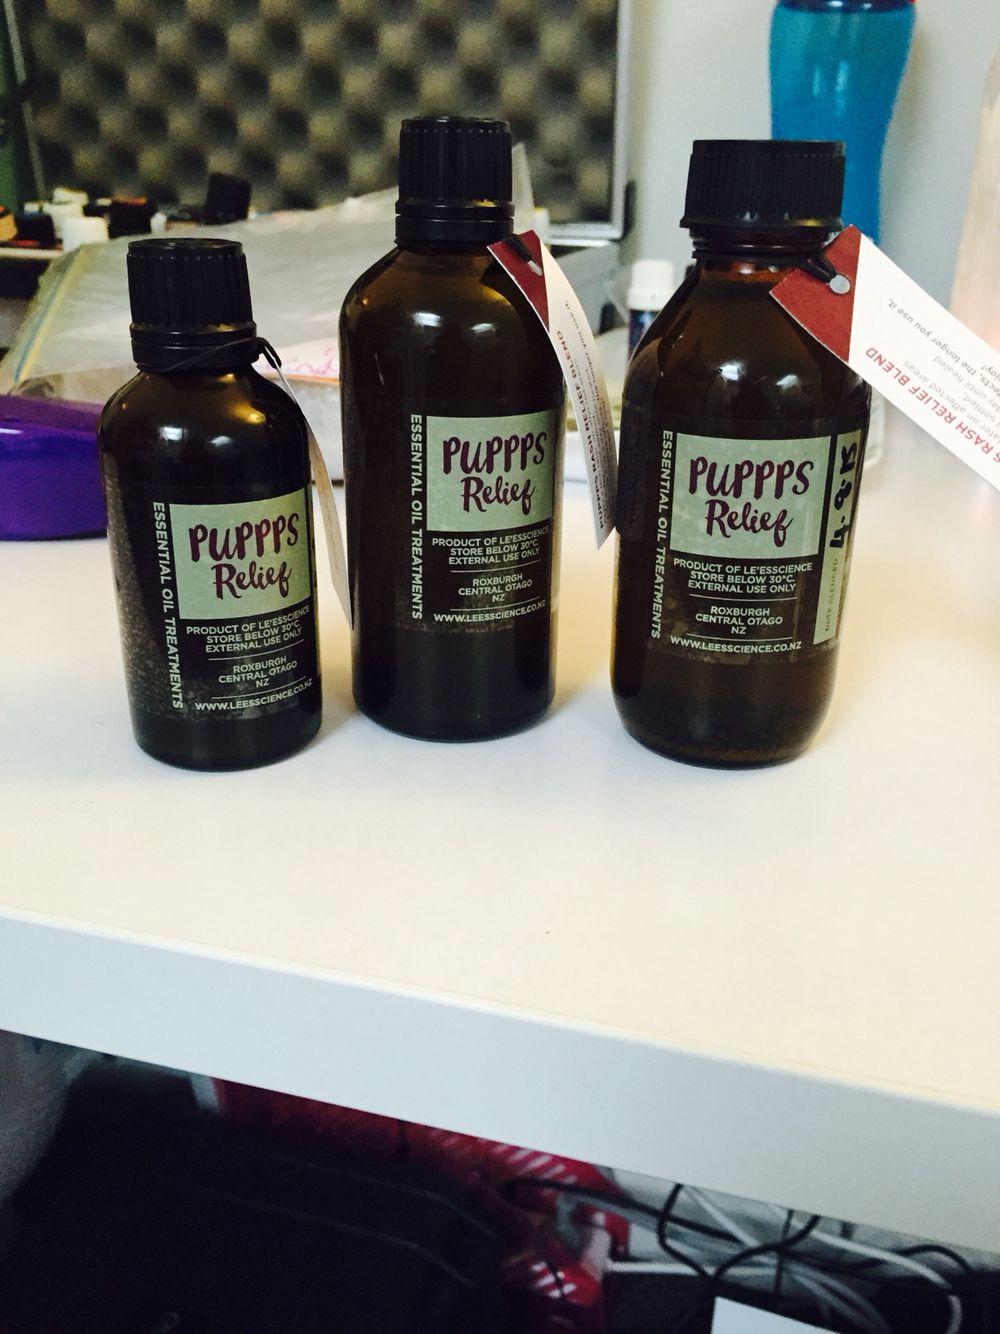 PUPPPS Relief 100 Natural / Vegan pure essential oils